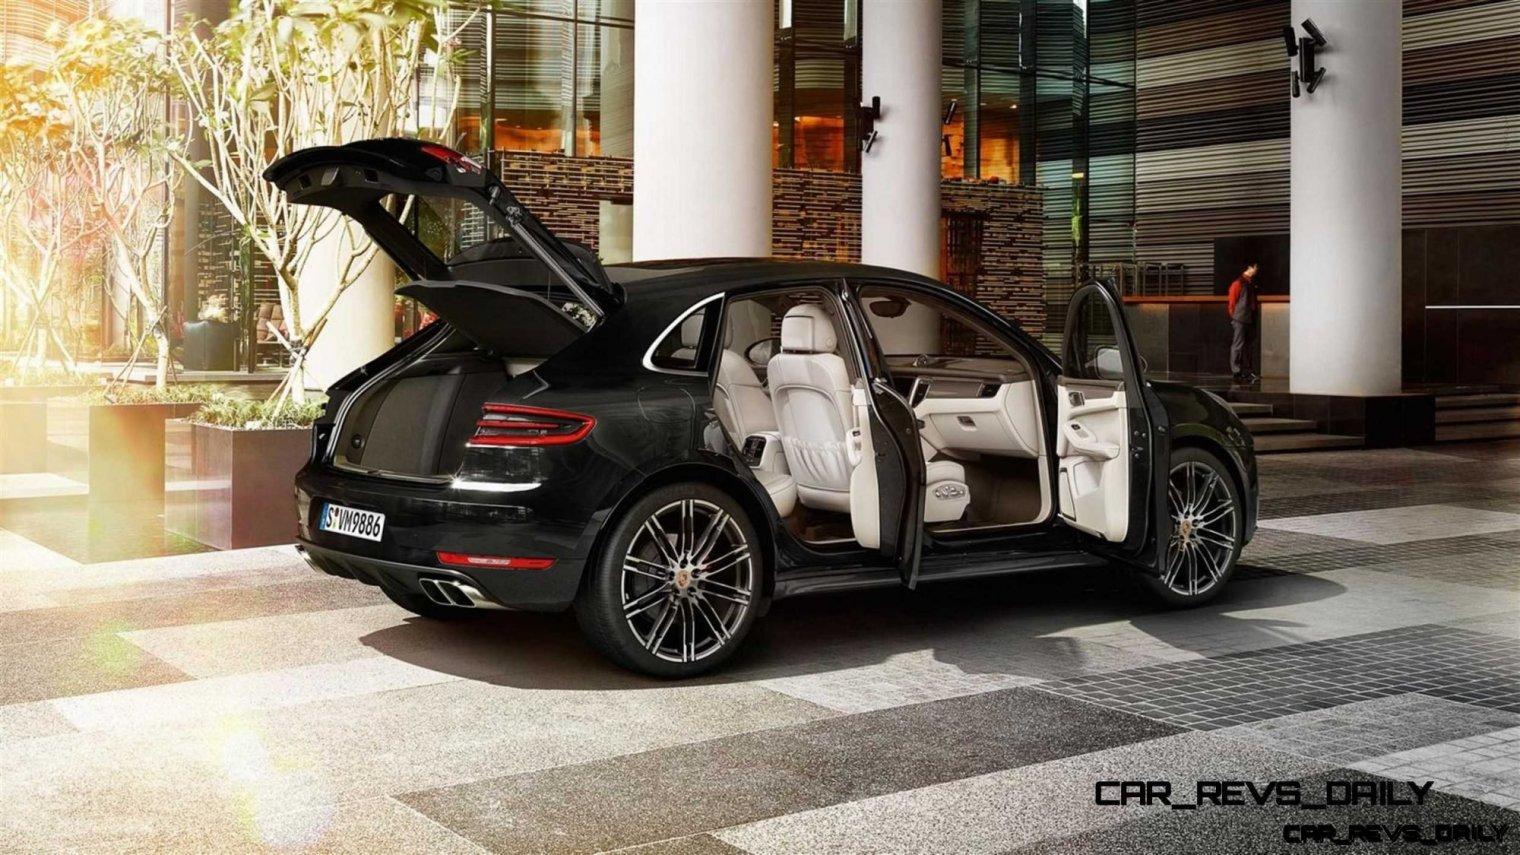 2015 Porsche Macan - Latest Images - CarRevsDaily.com 27